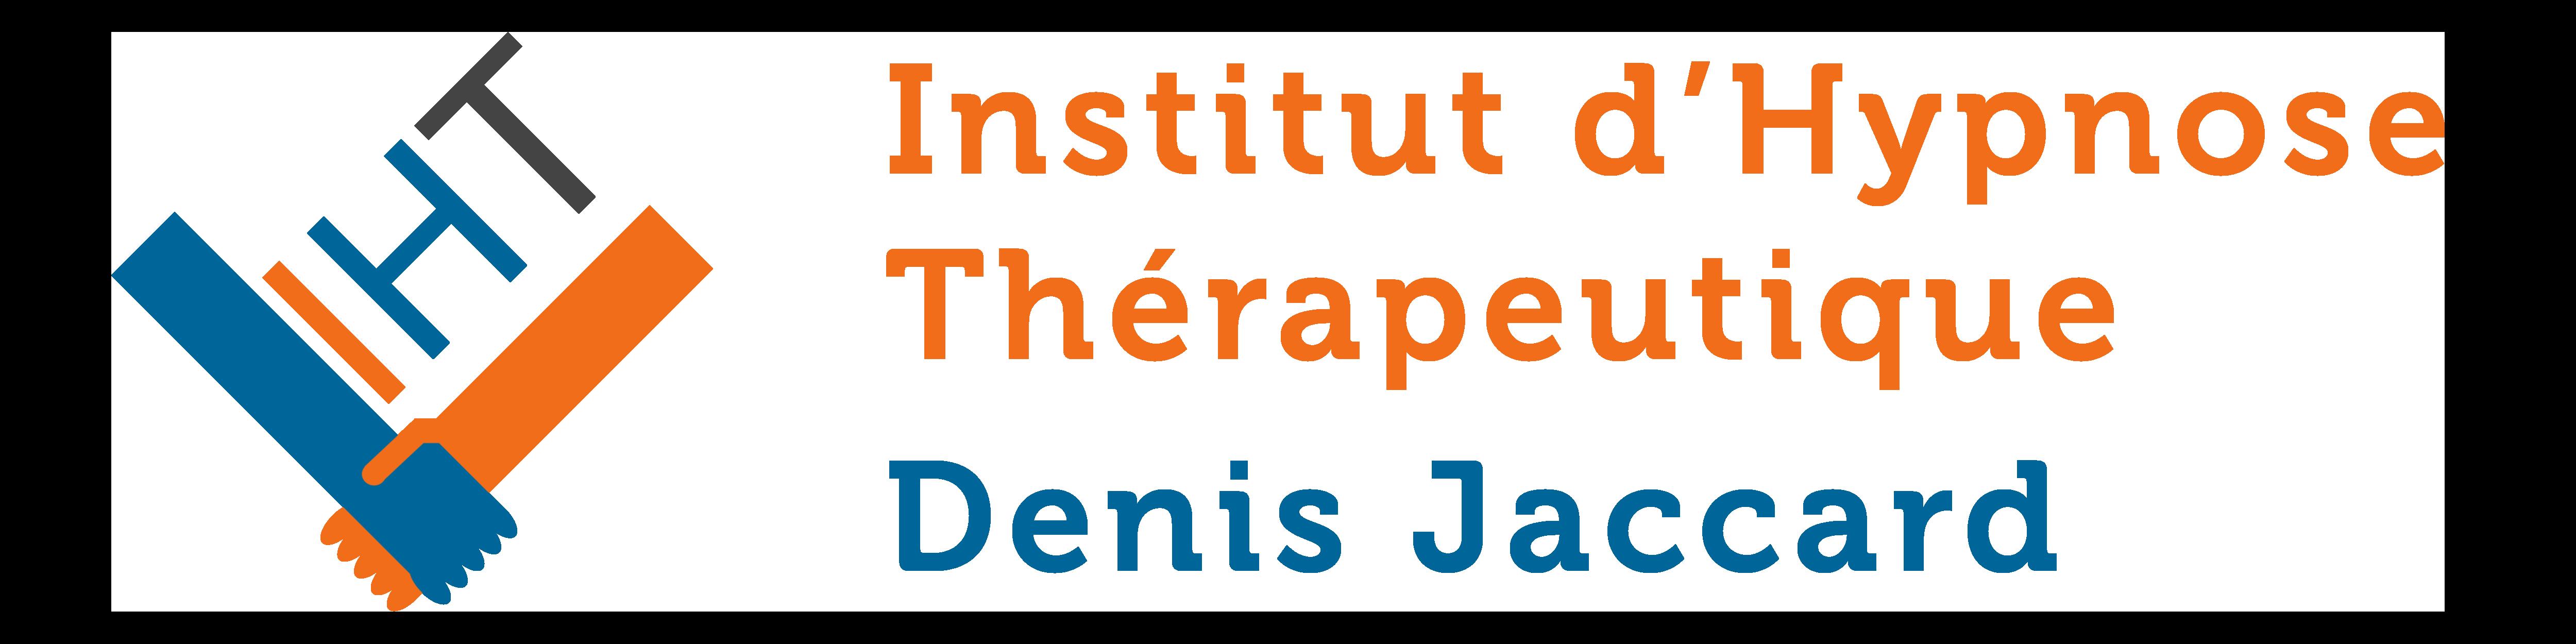 Institut d'Hypnose Thérapeutique – Denis Jaccard